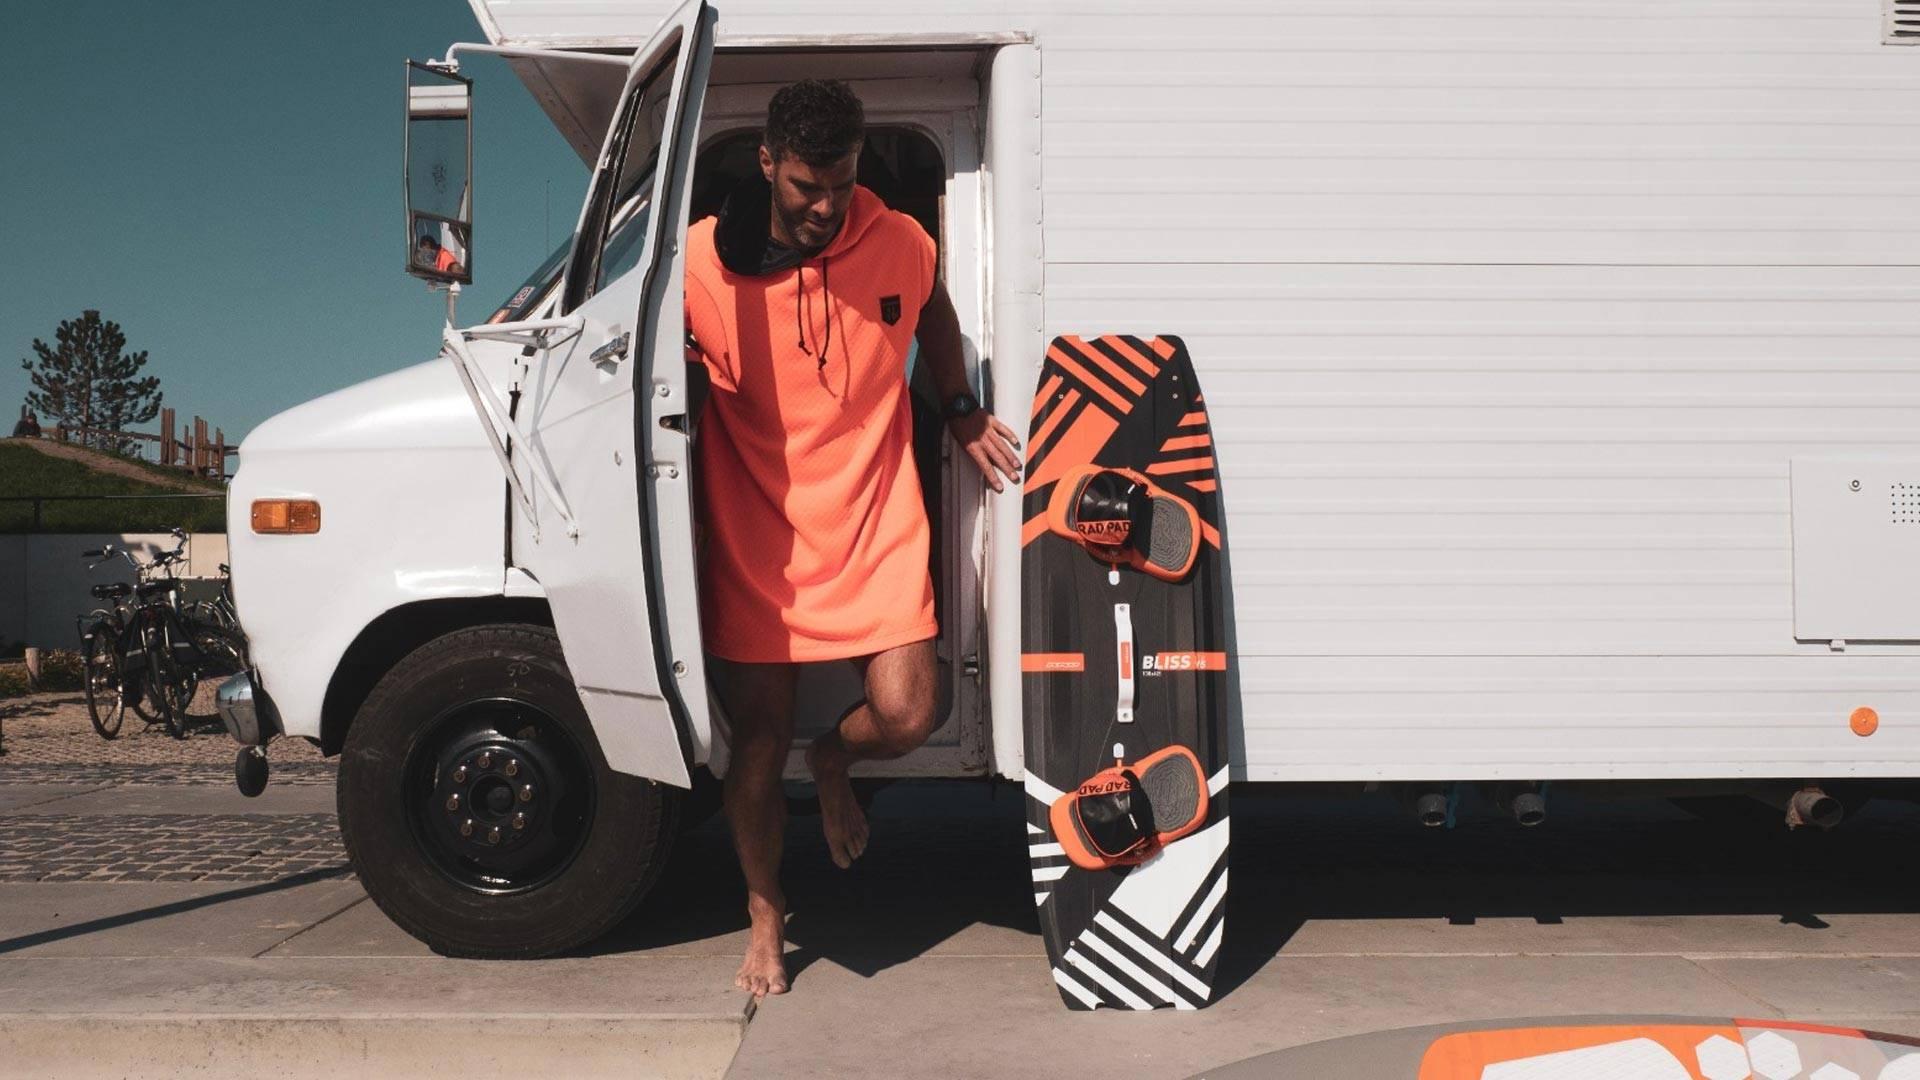 Premium Surf Poncho's by NTNK